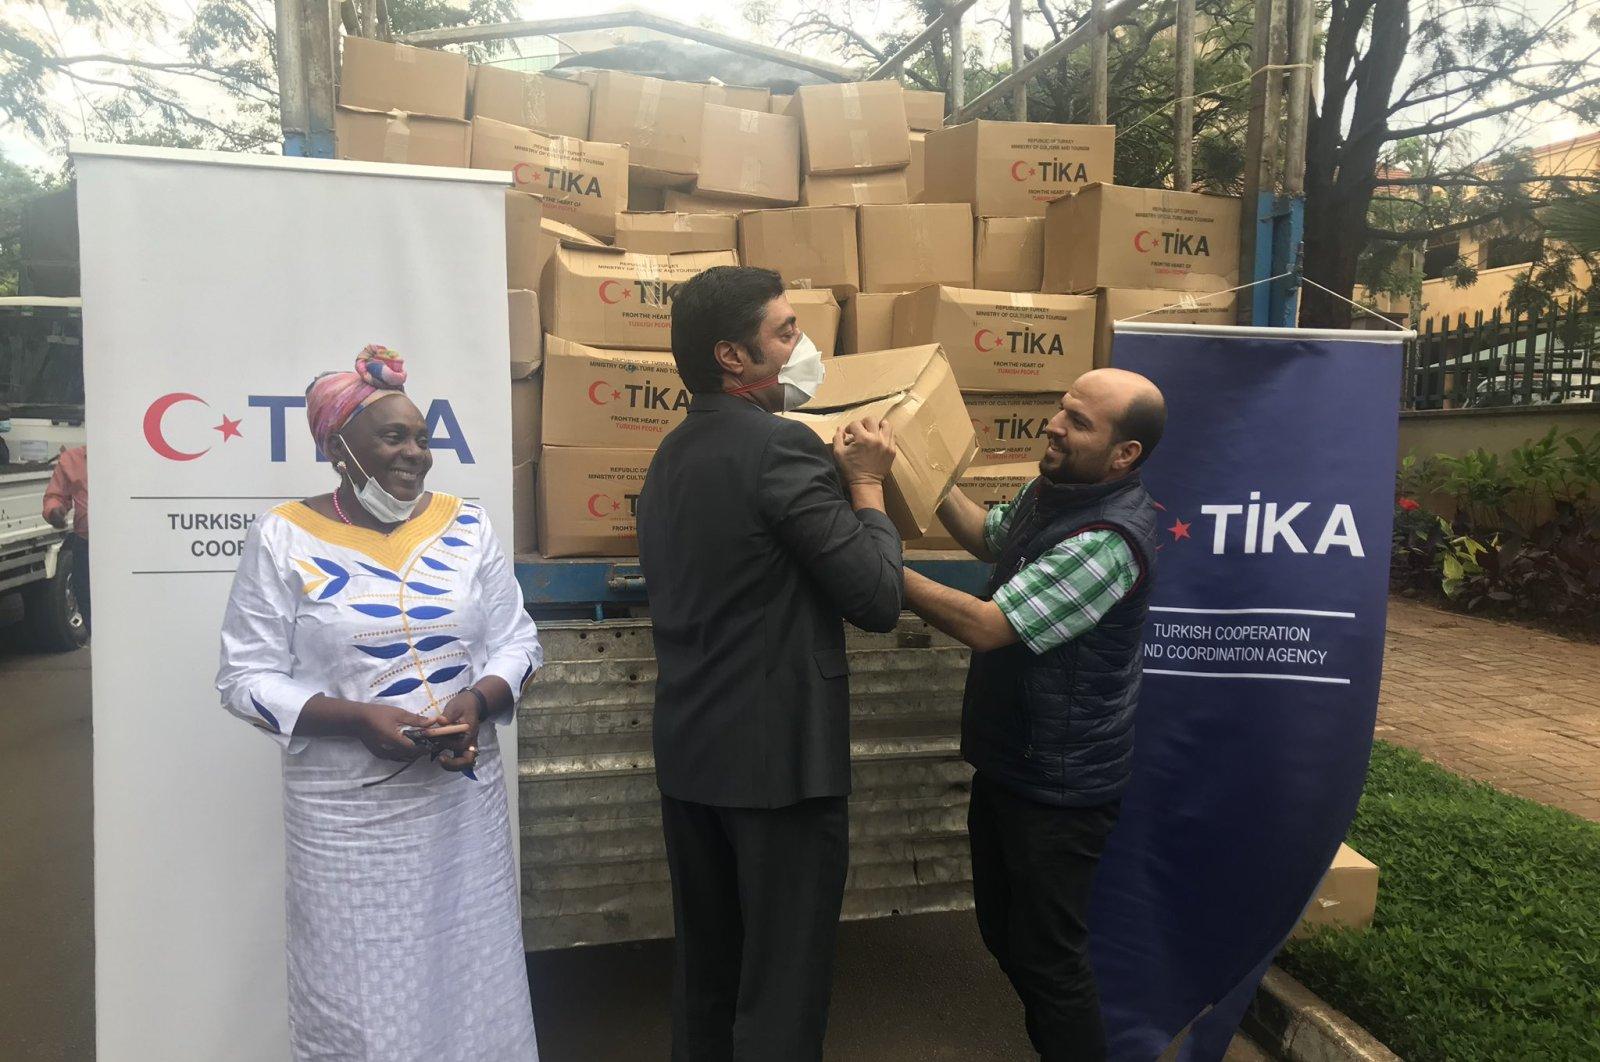 Turkey's state-run aid agency TİKA sent food aid to Uganda to help the East African country amid the coronavirus pandemic, April 27, 2020 (AA Photo)